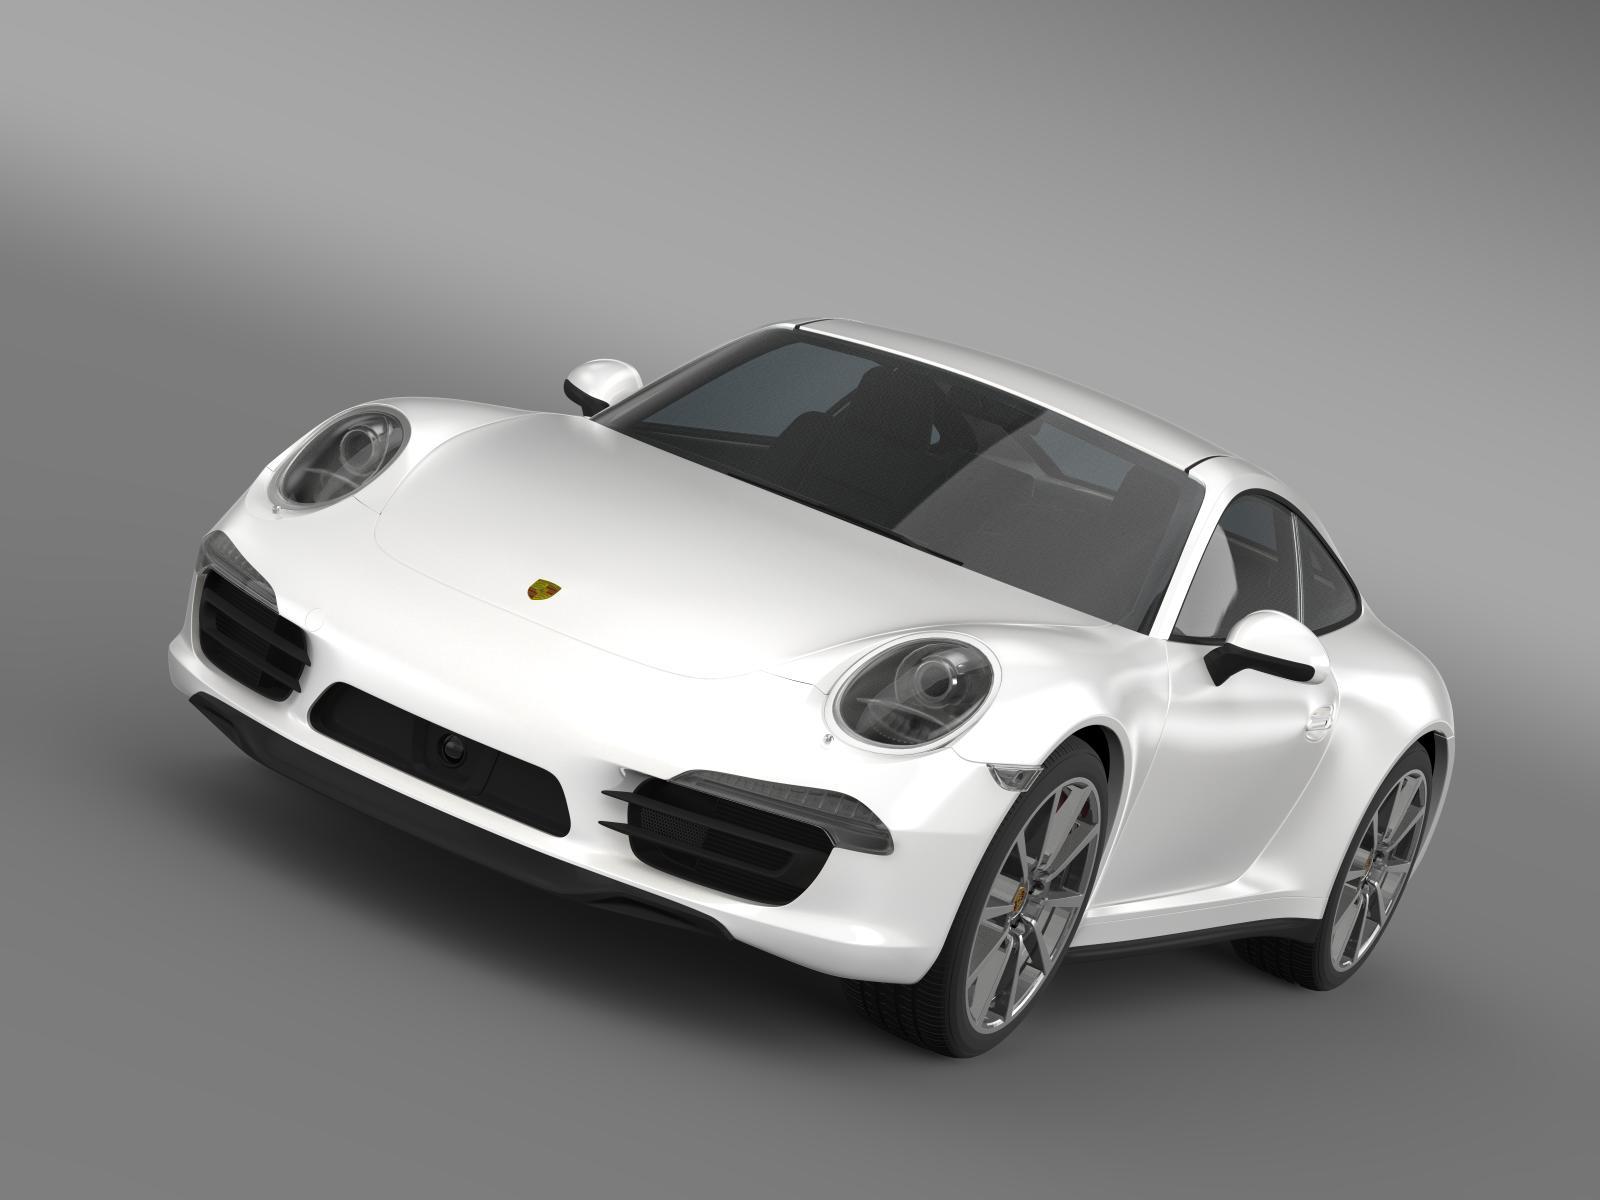 porsche 911 carerra 4s 2013 3d model 3ds max fbx c4d lwo ma mb hrc xsi obj 153604